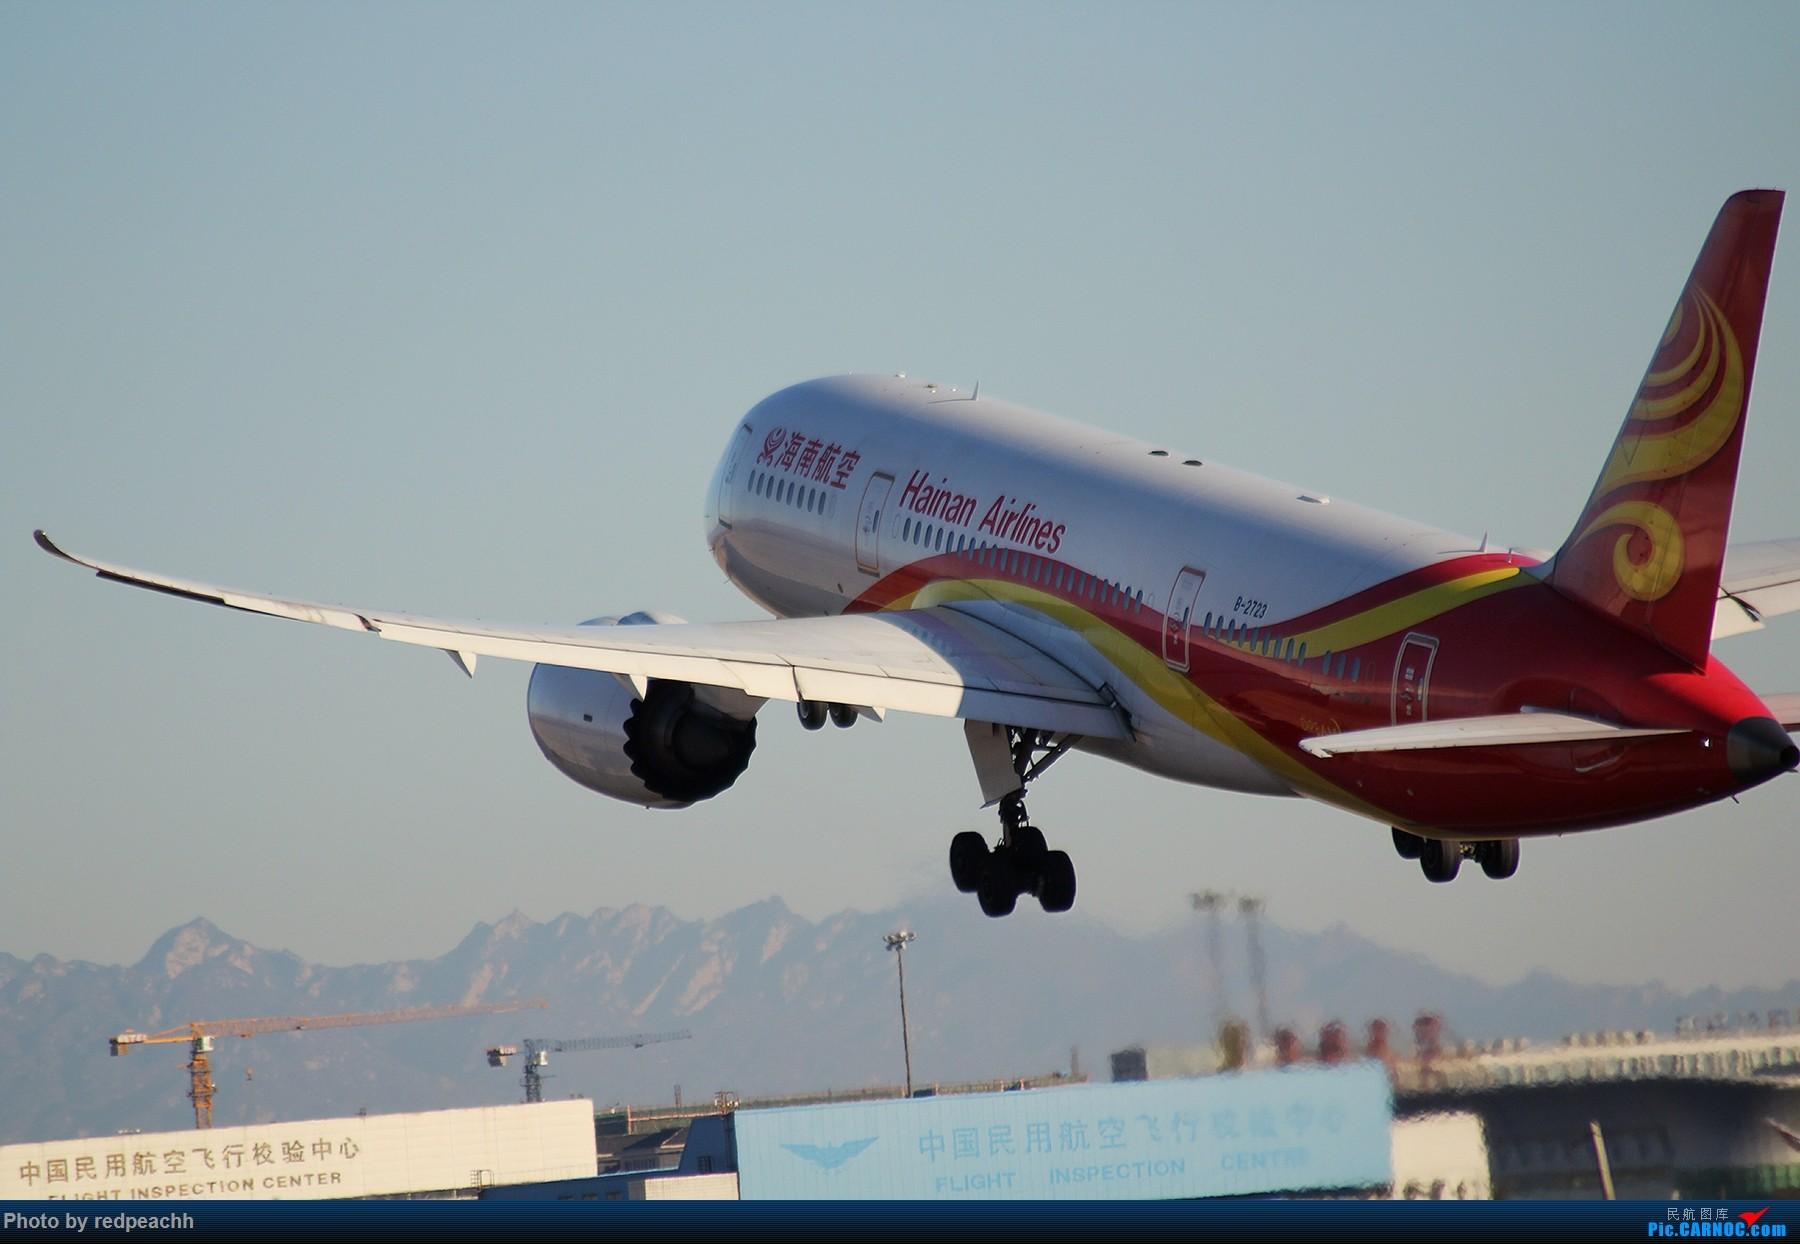 Re:[原创](持续更新)河北人为拍机而首都机场2日游(杨二营、八卦台)虽均为常规货但值得纪念(36L) BOEING 787-8 B-2723 中国北京首都国际机场